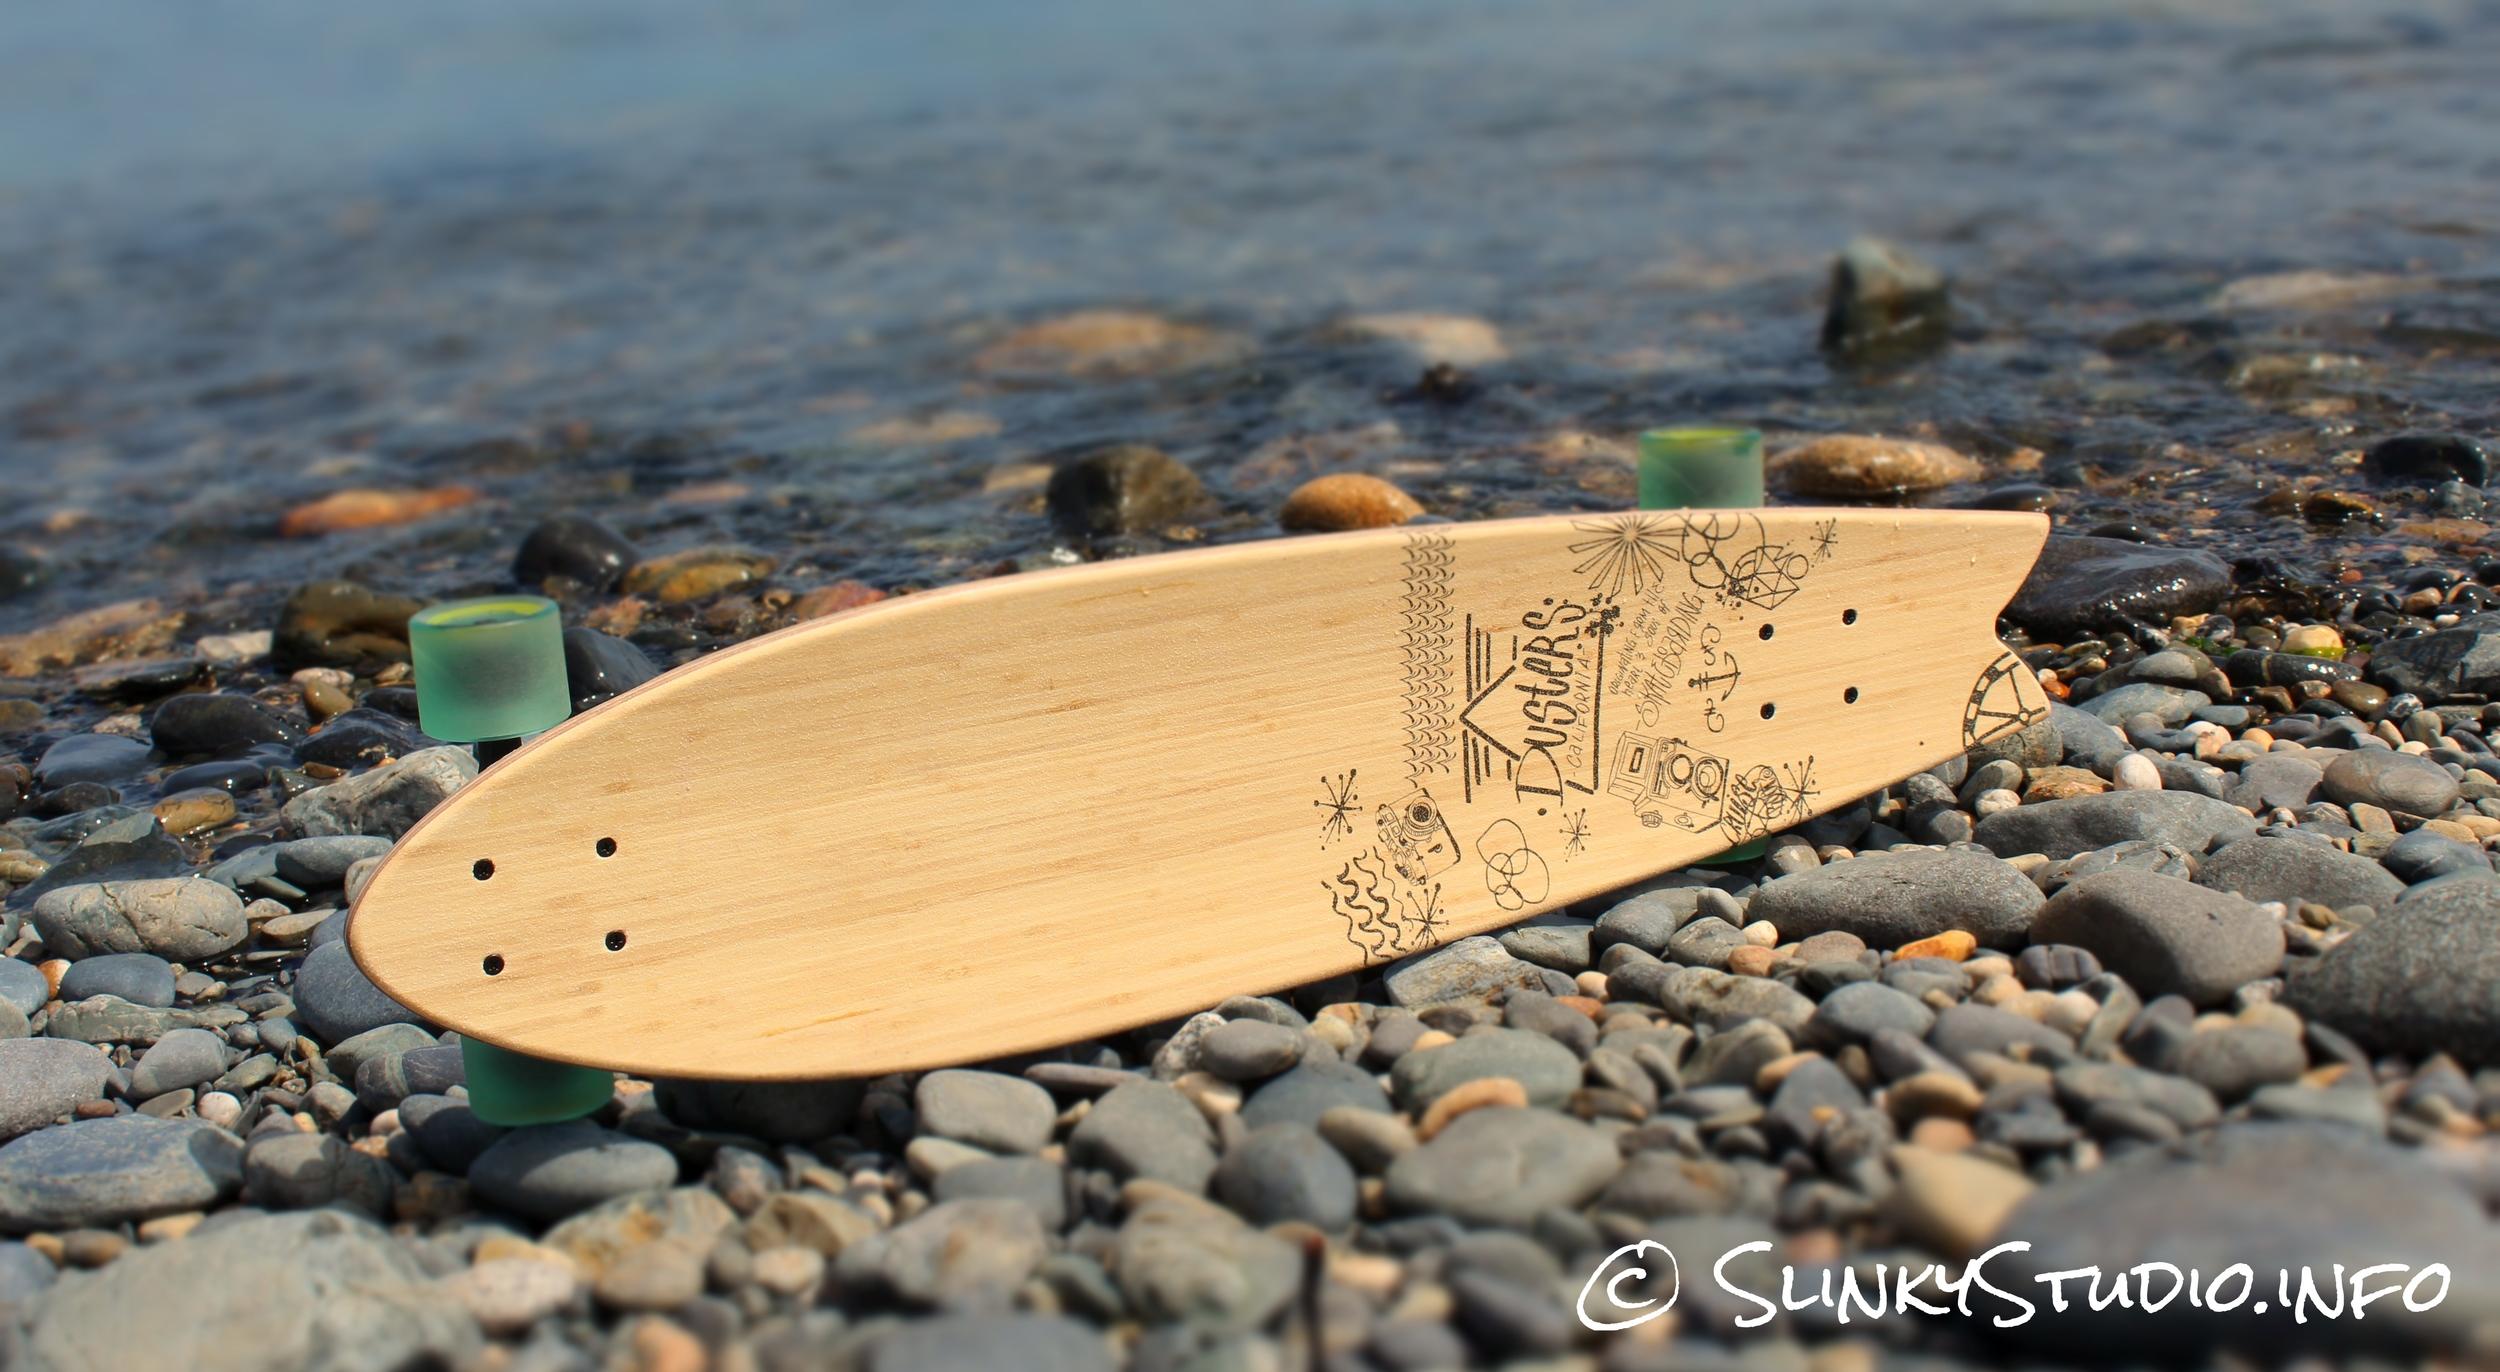 Dusters Snapshot Longboard Deck Full View